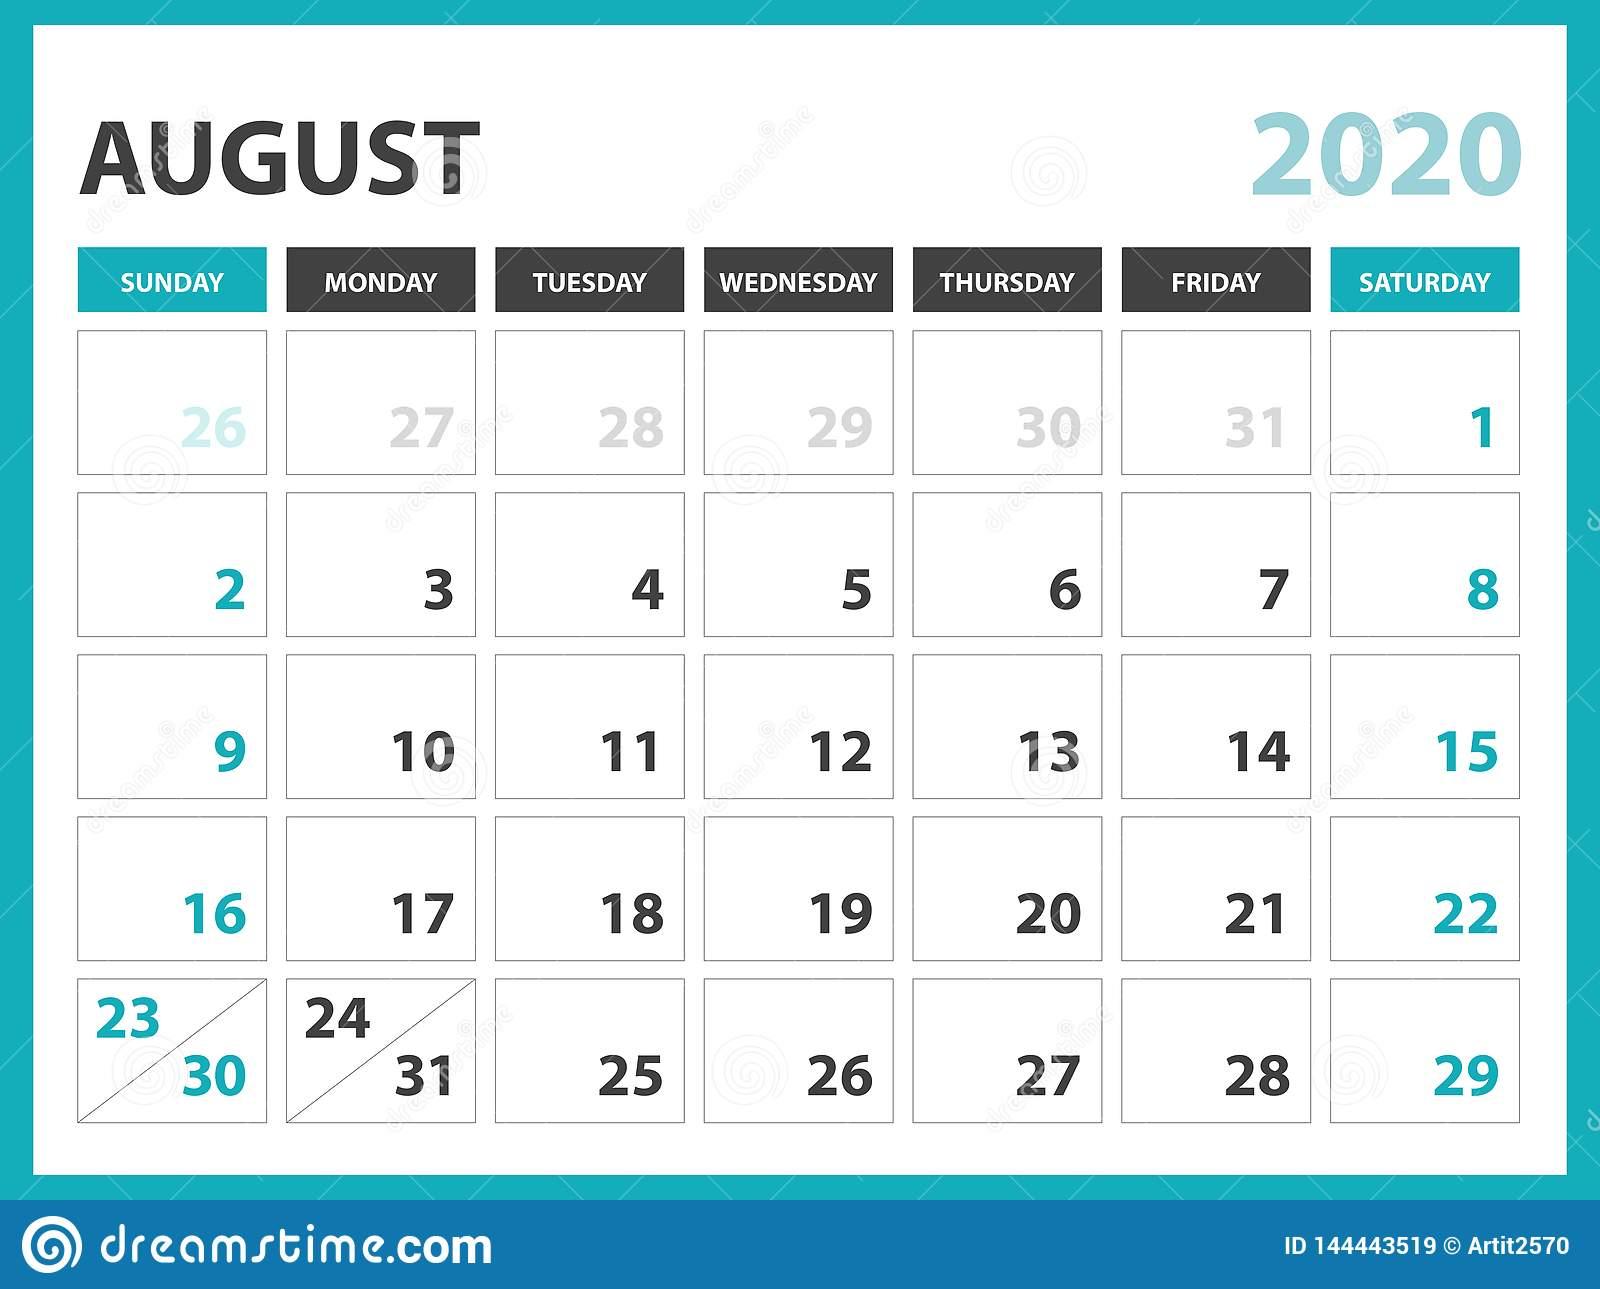 Desk Calendar Layout Size 8 X 6 Inch, February 2020 Calendar